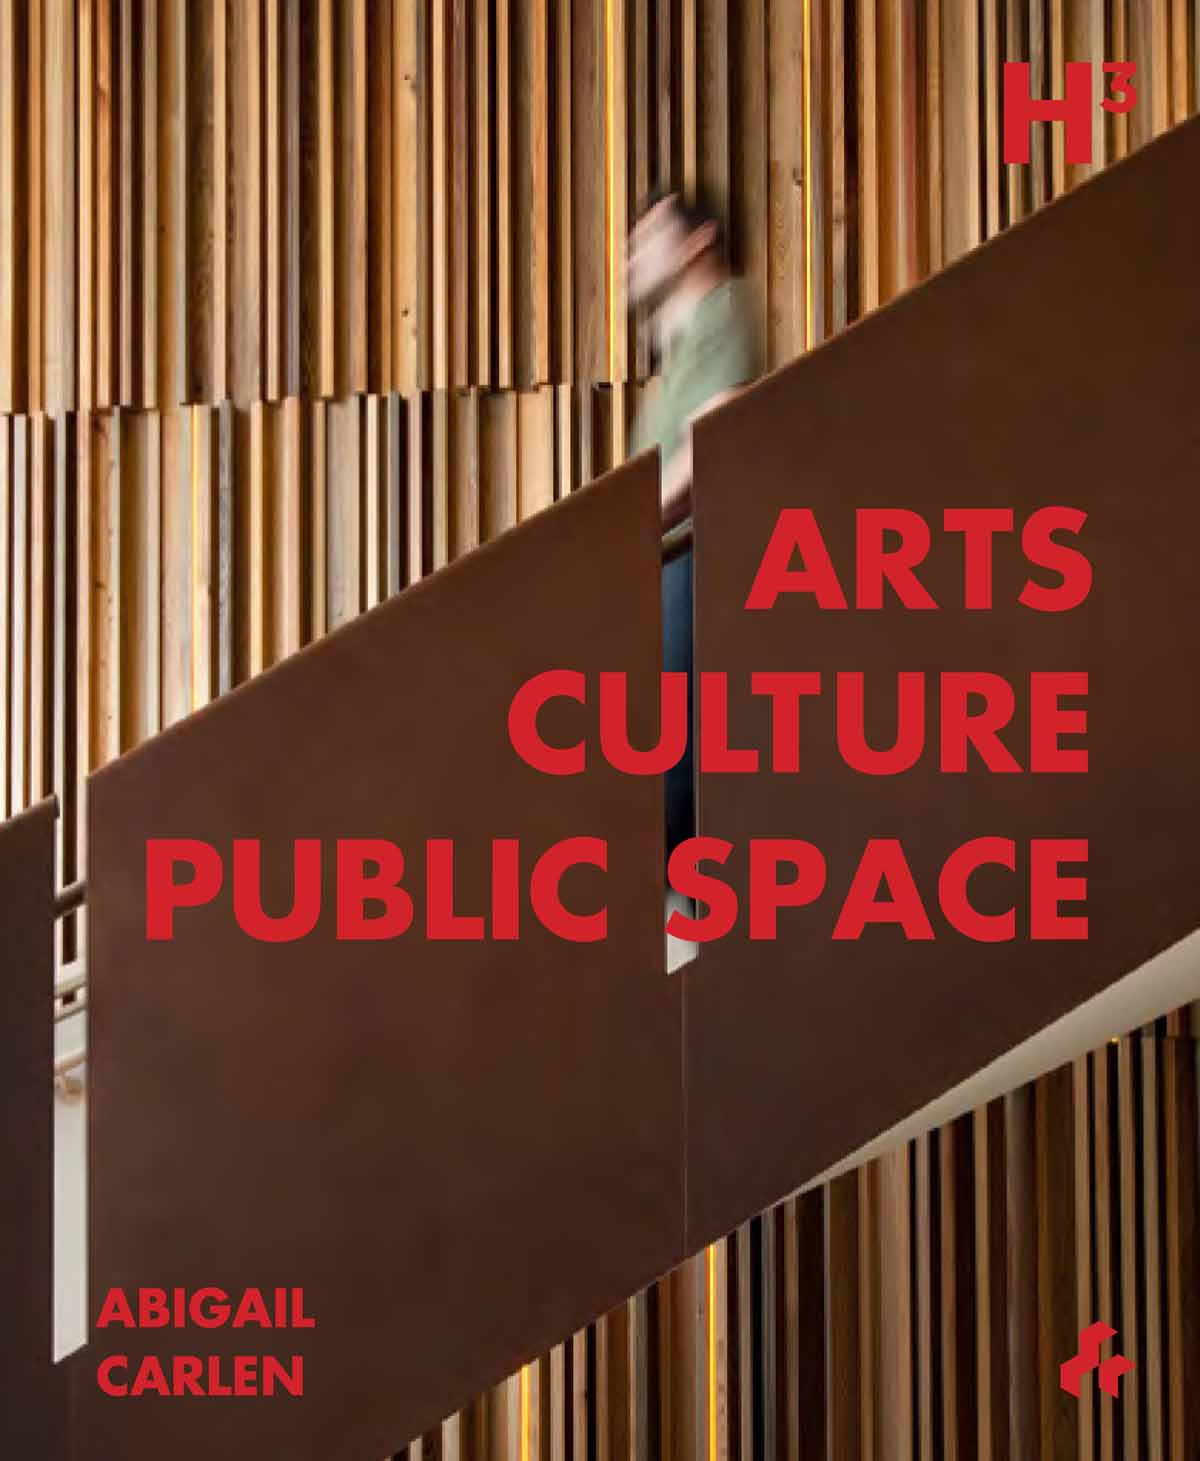 Arts Culture Public Space carlen abigail arts culture public space